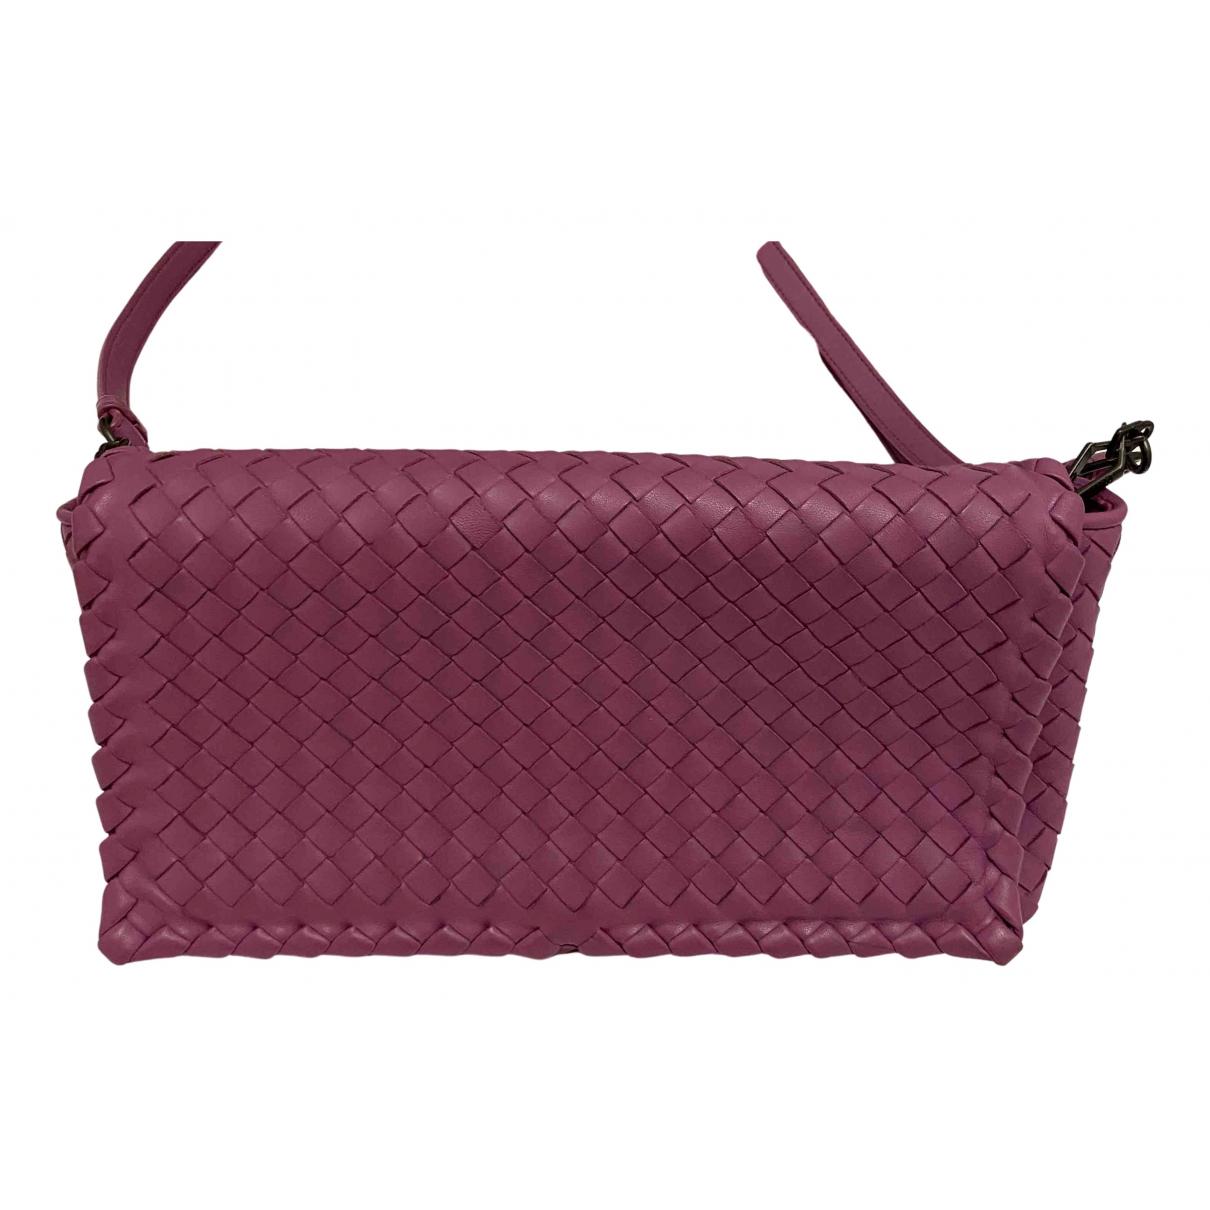 Bottega Veneta - Sac a main   pour femme en cuir - violet